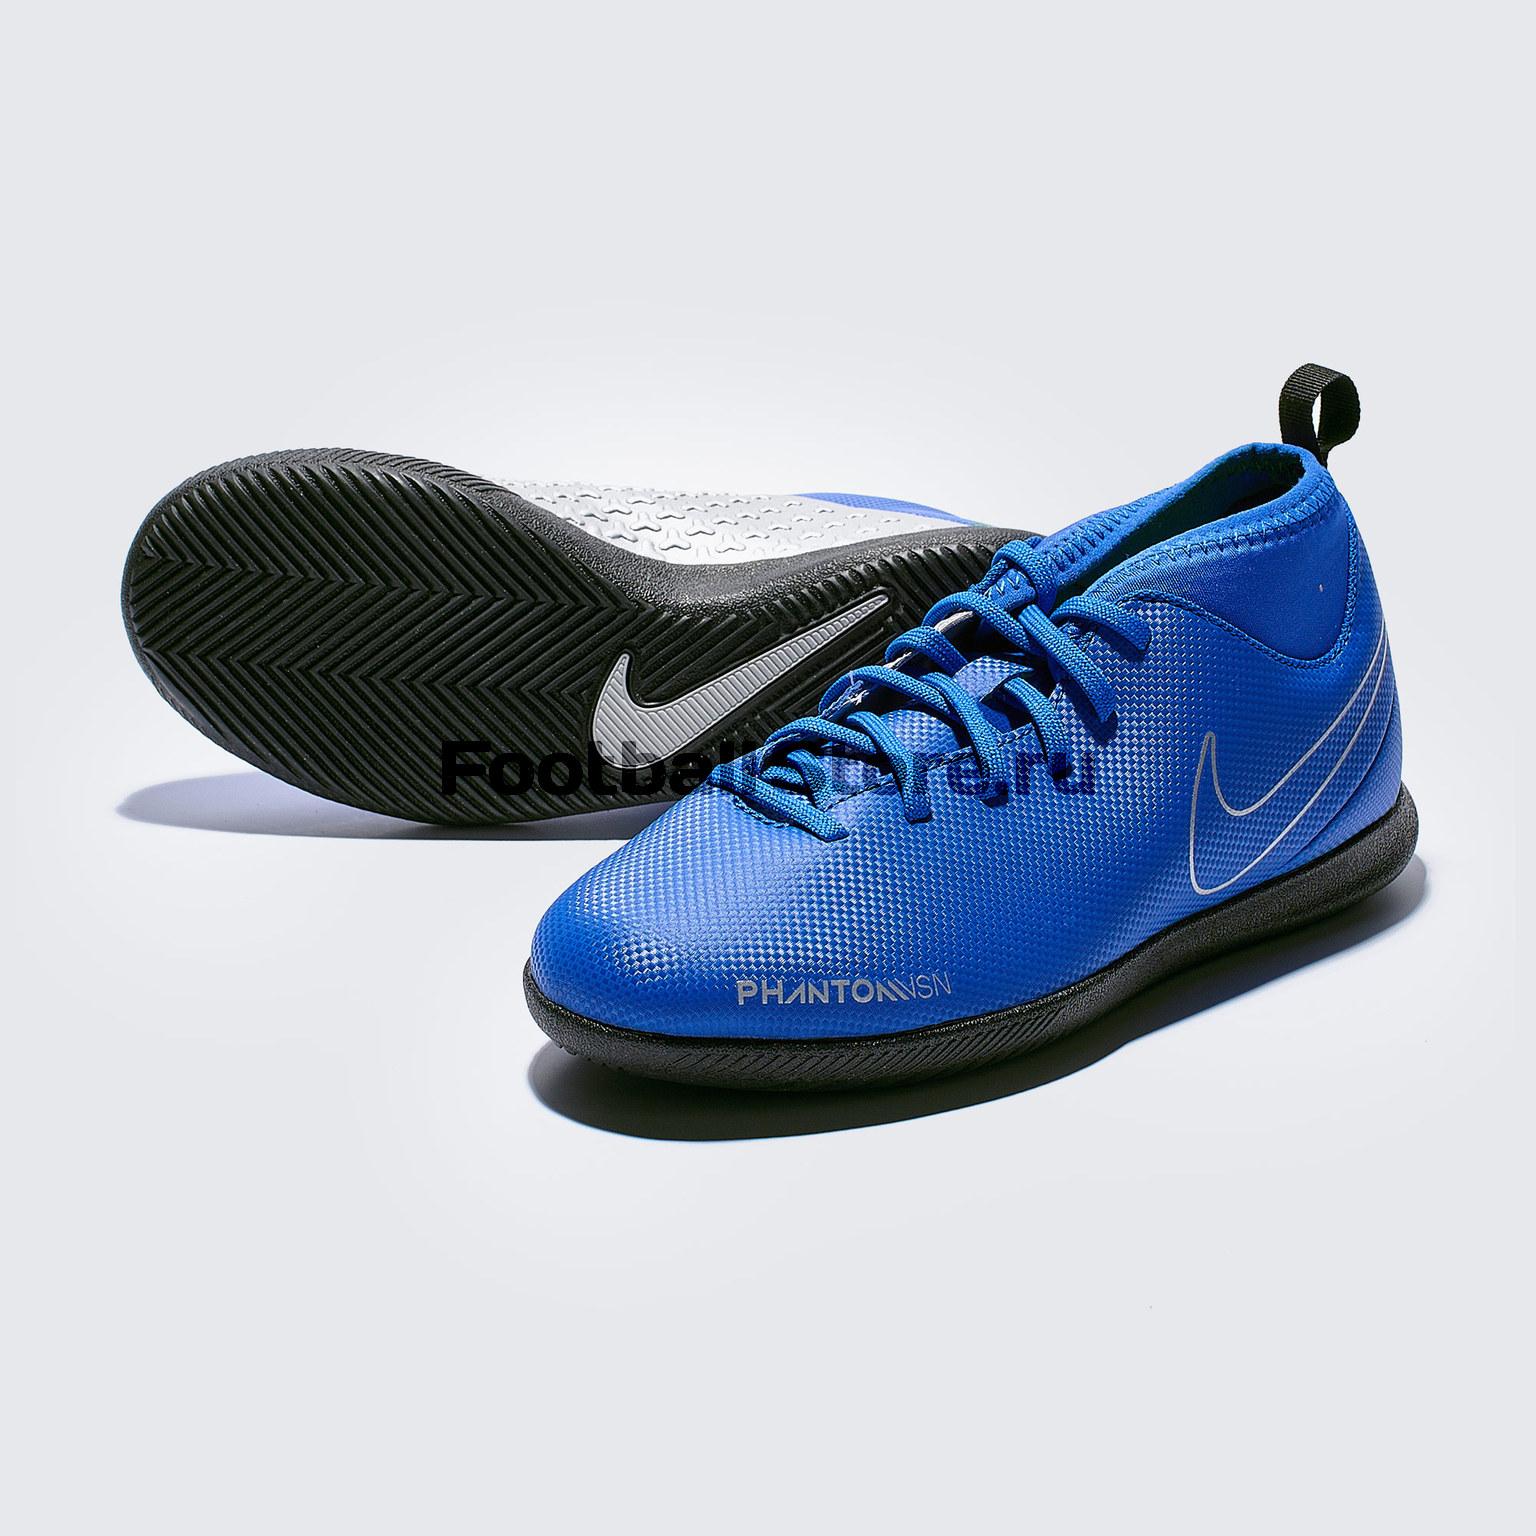 Фото - Футзалки детские Nike Phantom Vision Club DF IC AO3293-400 шиповки детские nike phantom vision club df tf ao3294 001